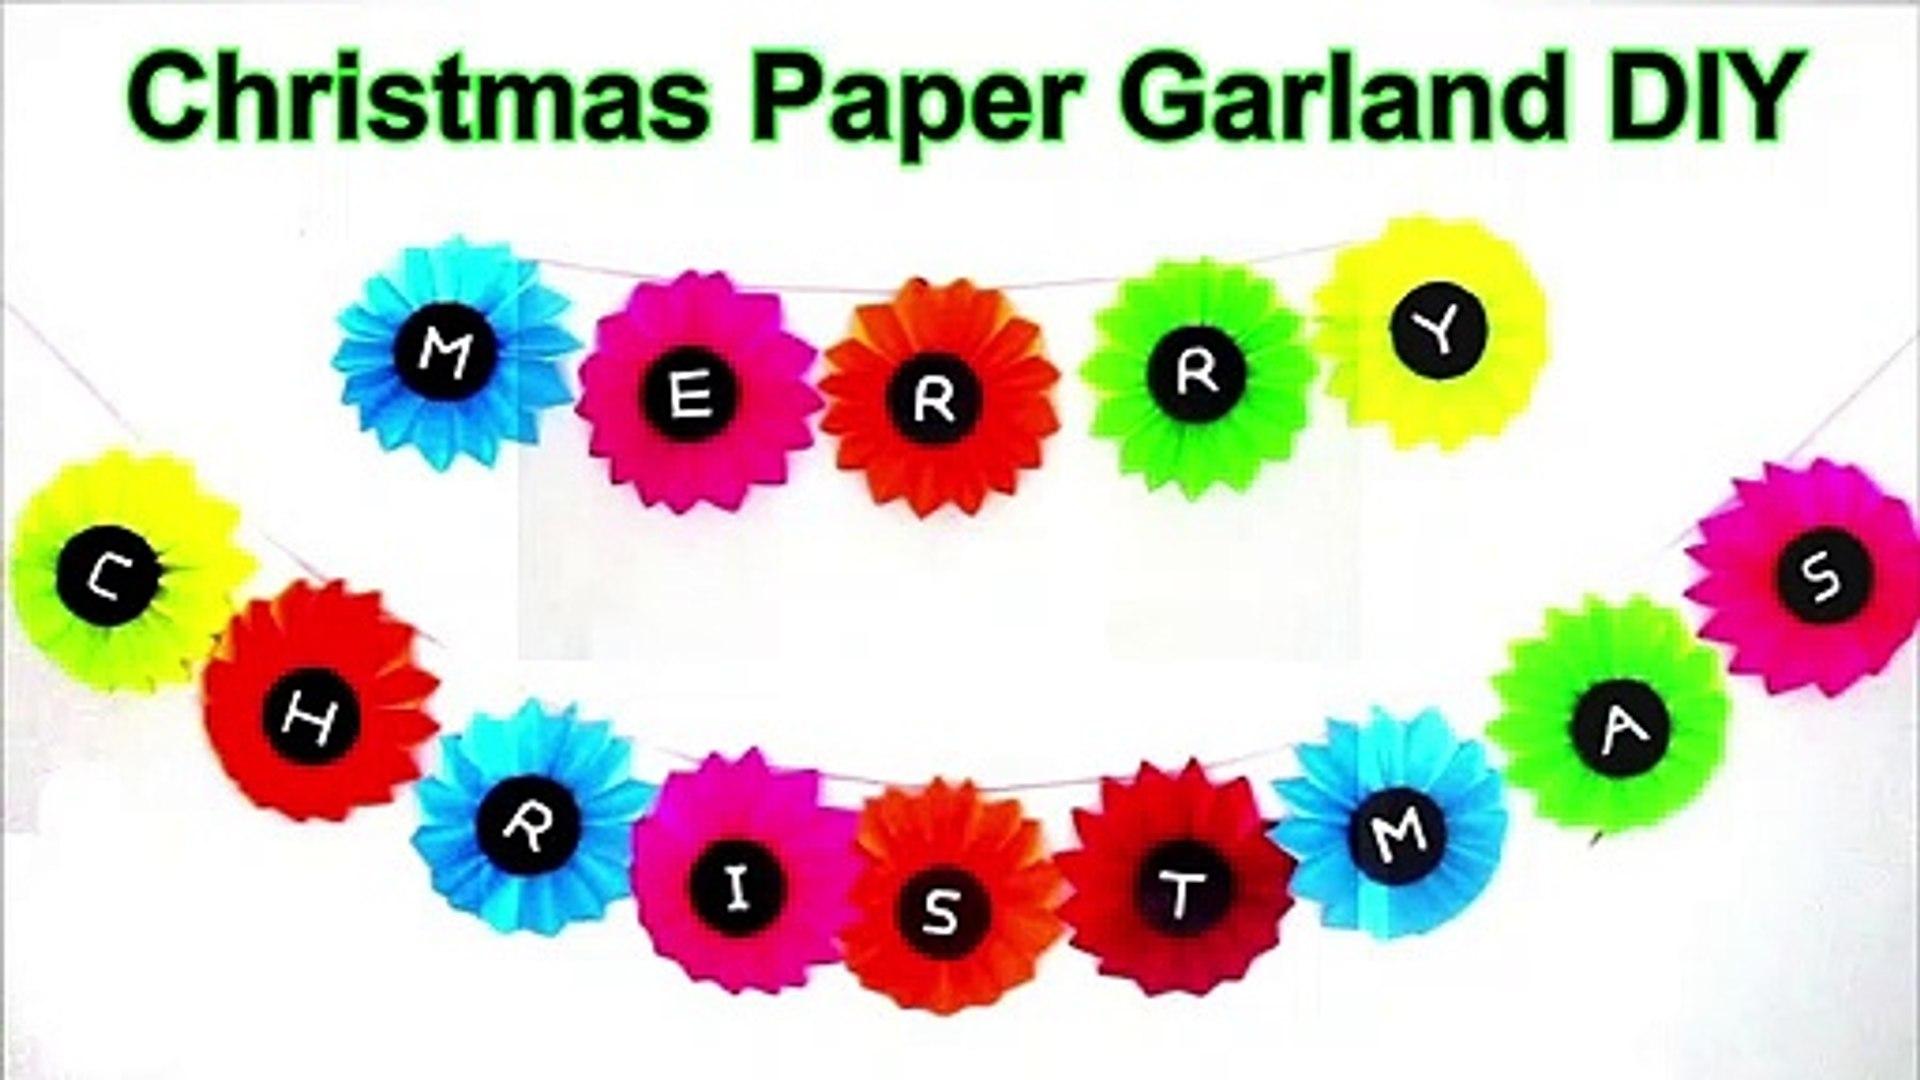 Christmas Paper Garland DIY   Christmas Decorations Ideas 2020   Christmas Garland Ideas   Homemade